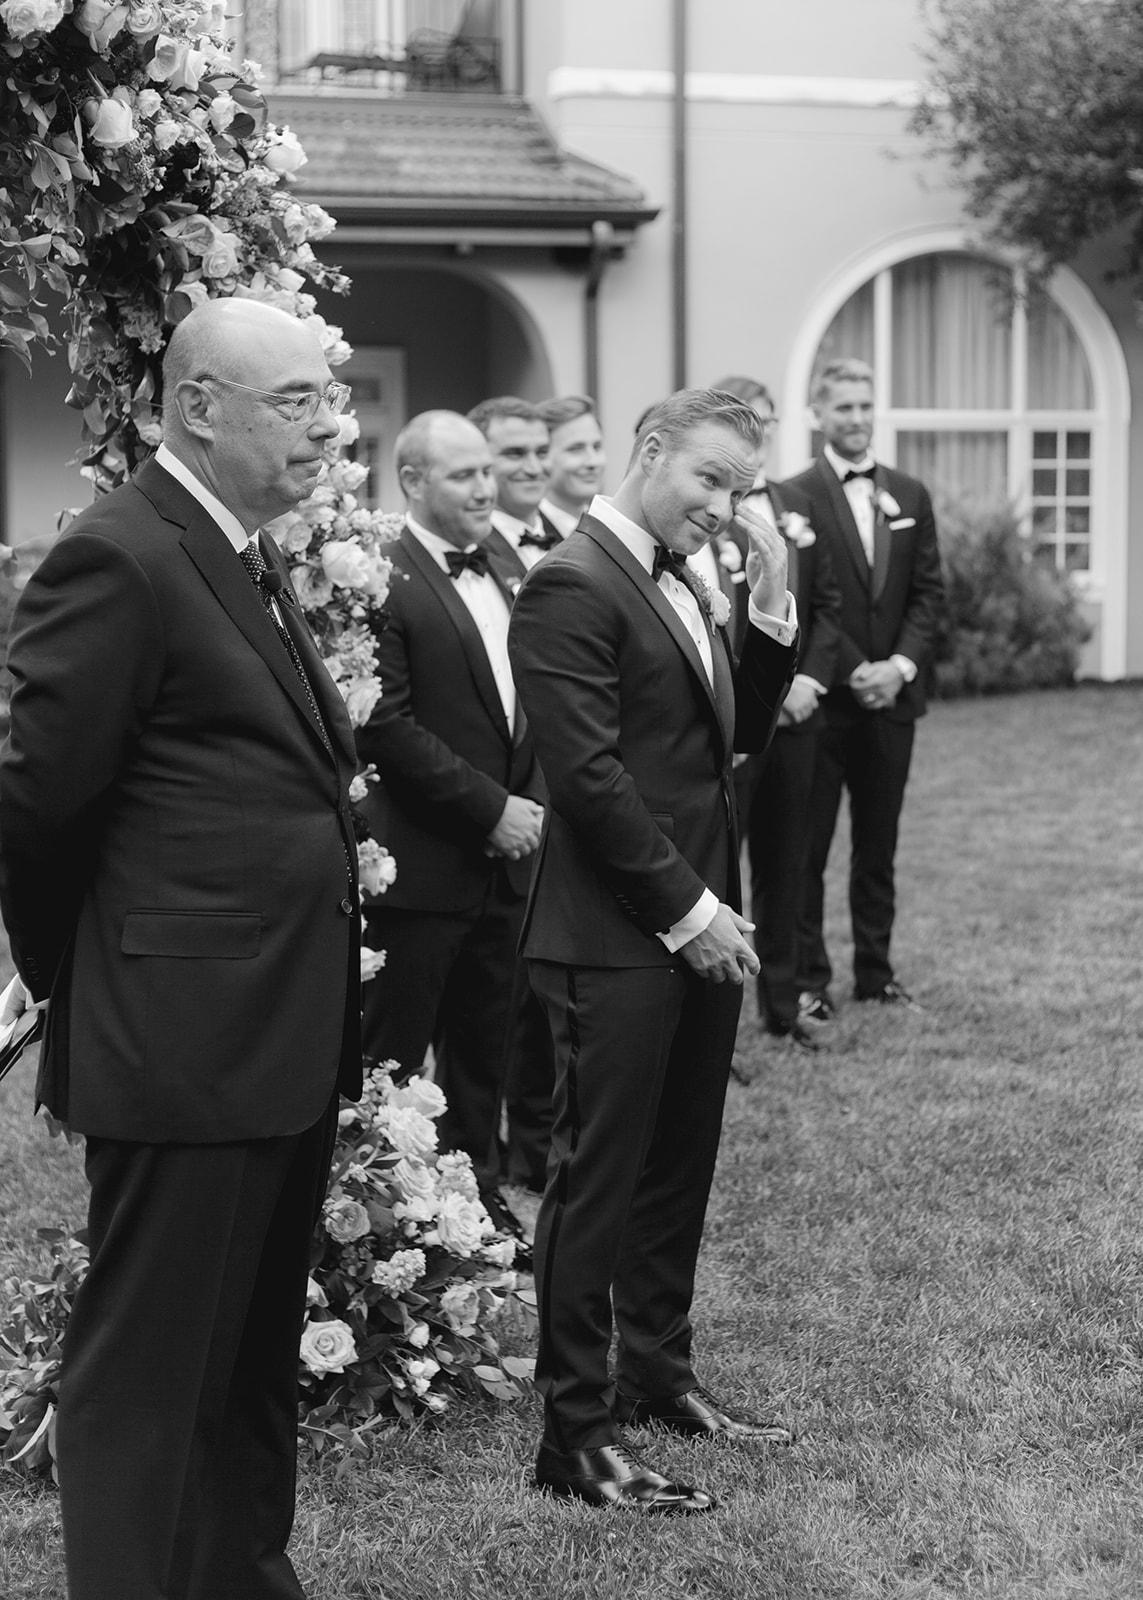 black and white photo Erik at altar with groomsmen